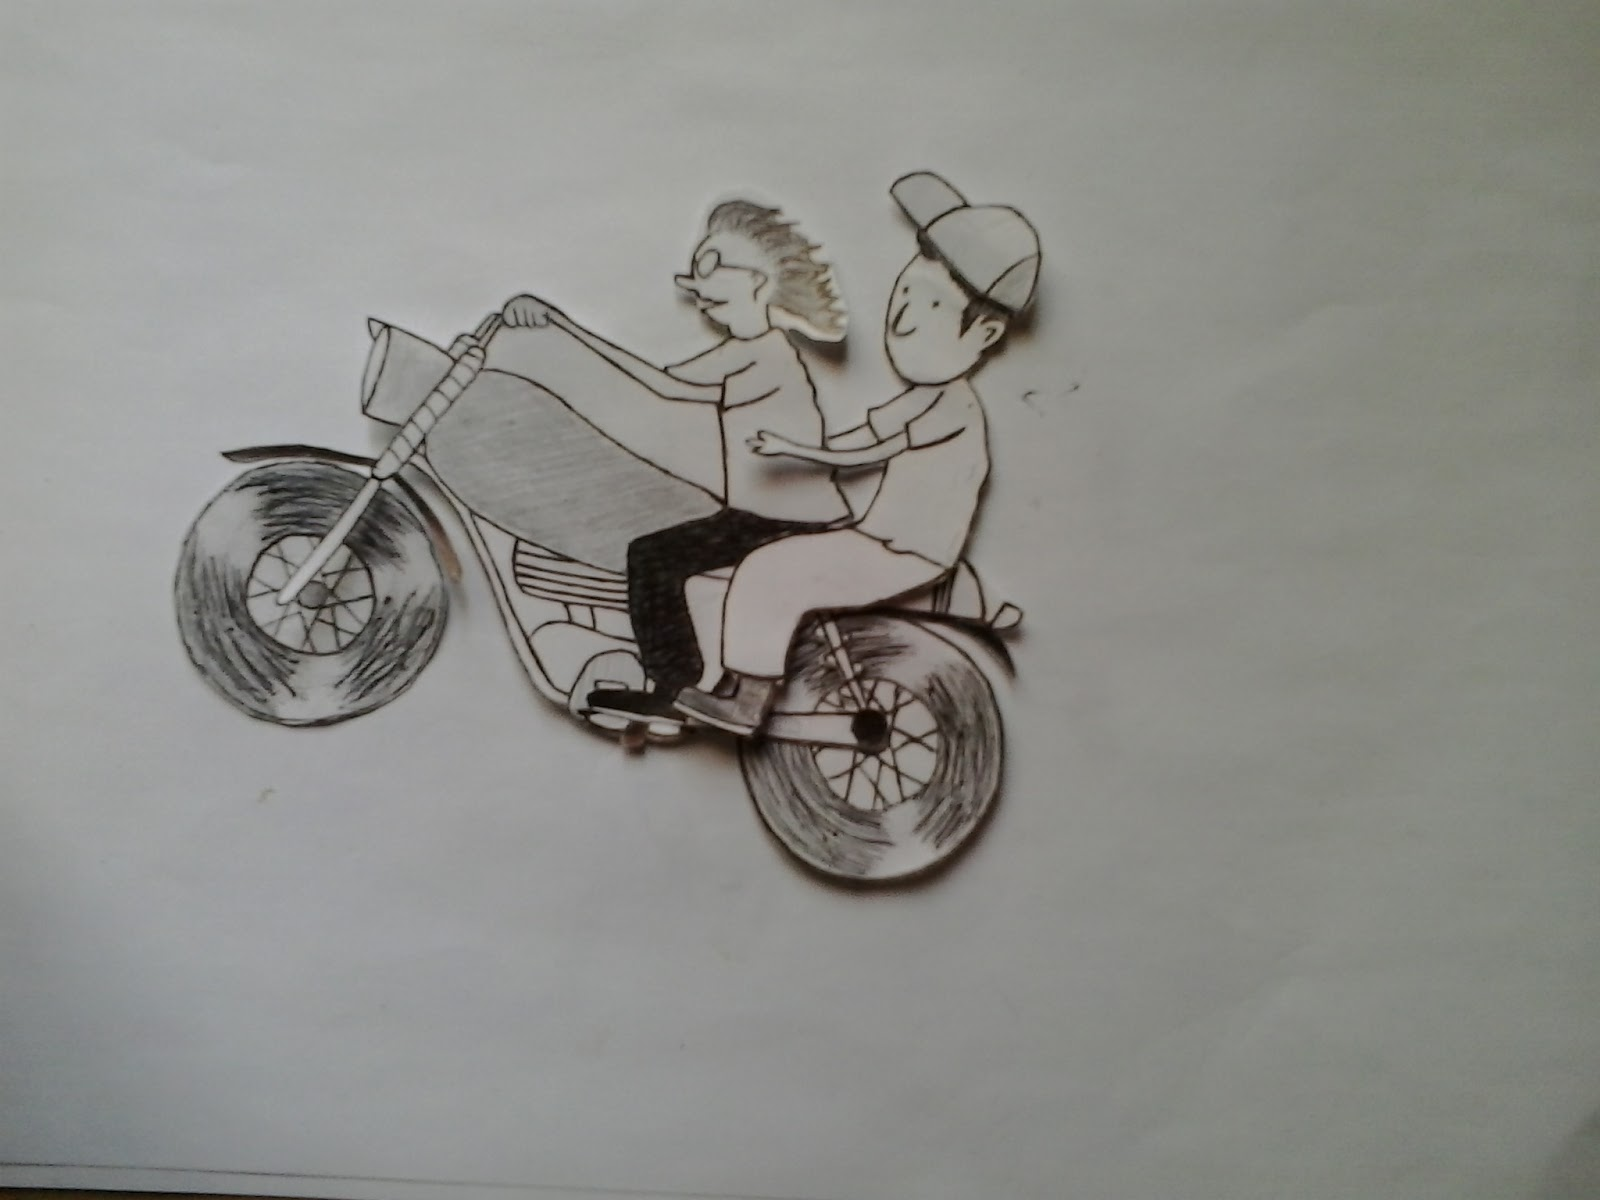 Cara Menggambar Motor Drag Di Kertas Langkah Demi Langkah Stylecustom